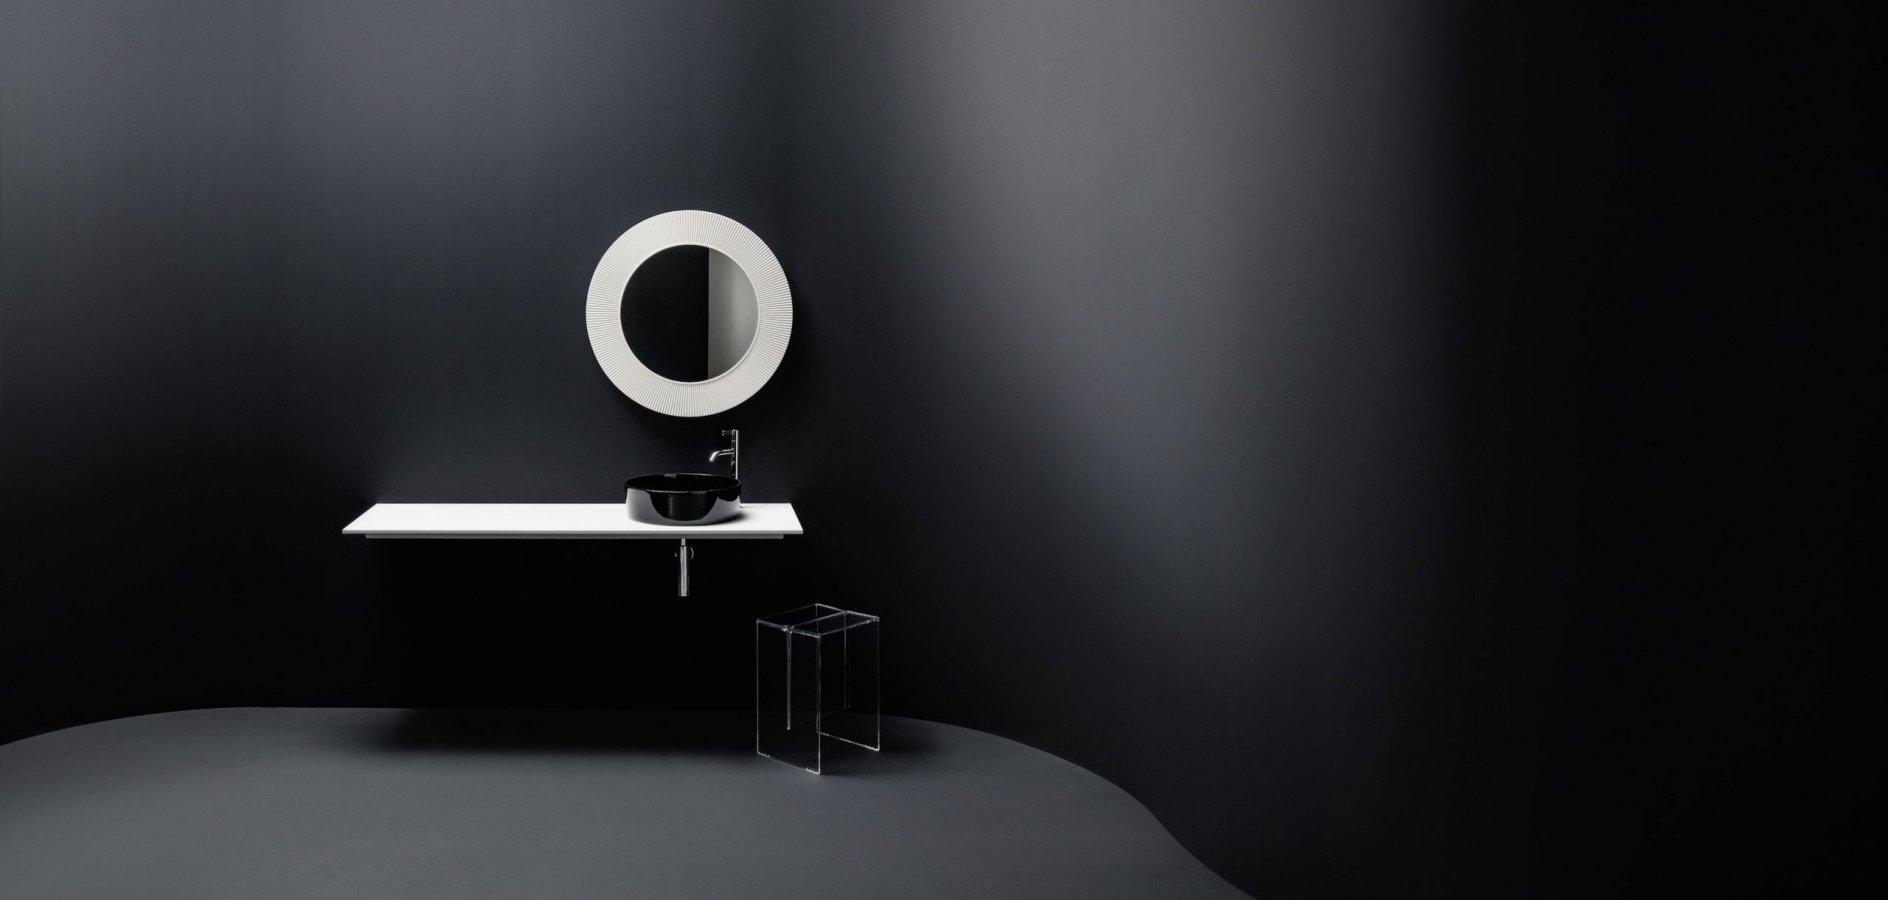 Designblok 2021, laufen, výstava, keramika, design, expozice, koupelna, kartell by laufen